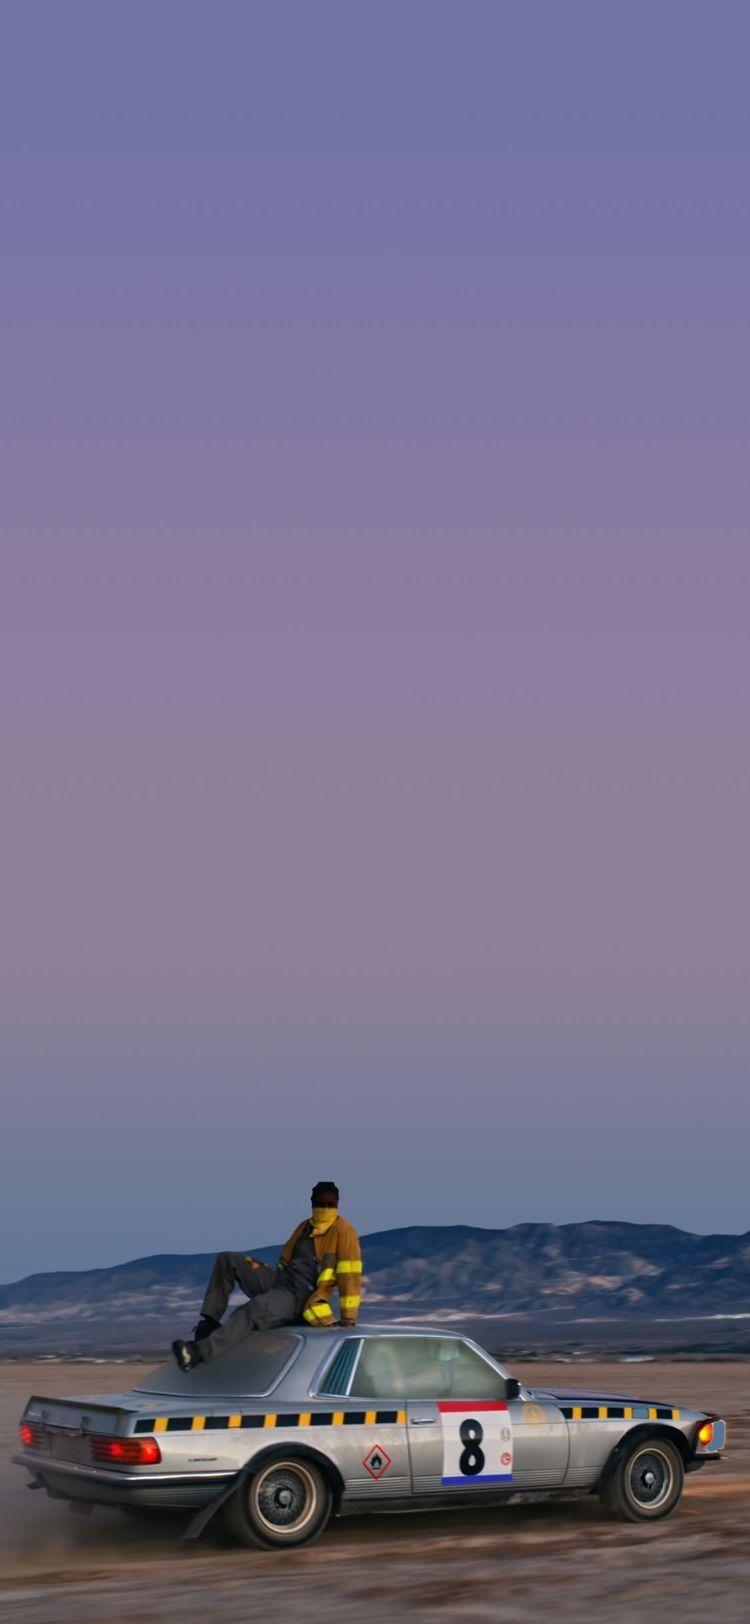 Pin by Martin Topalov on Rare Files Asap rocky wallpaper iphone 750x1624